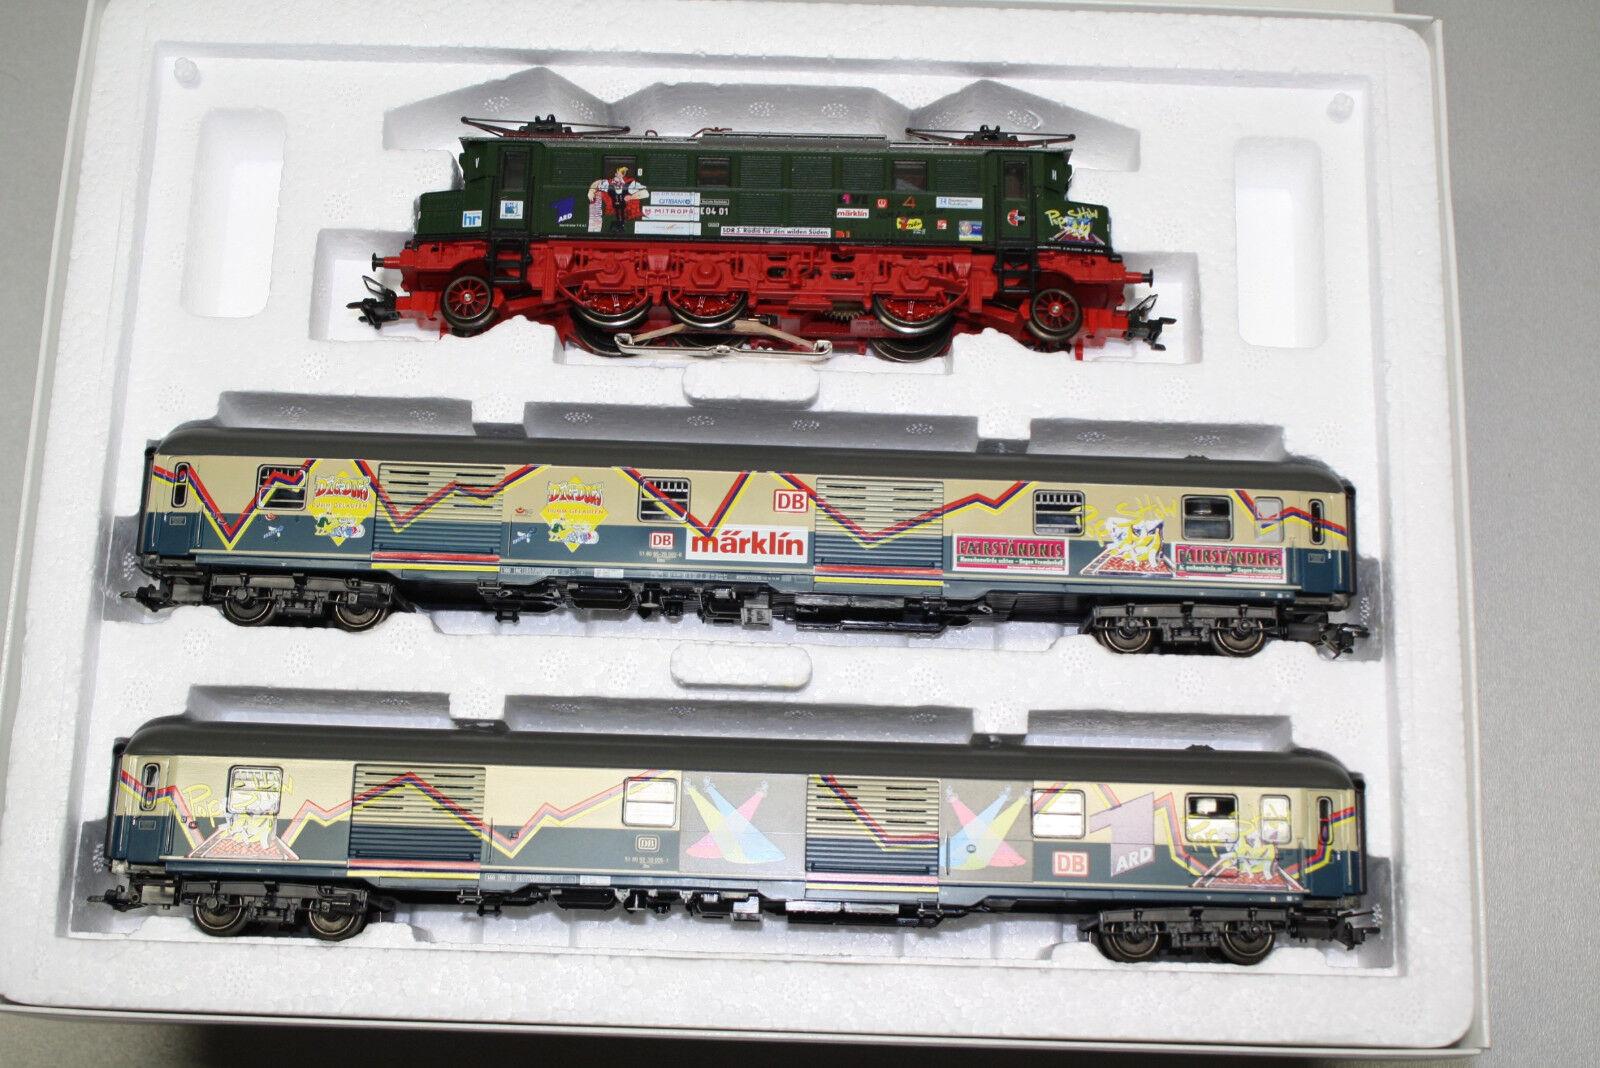 marklin 2872 Set Treni Poptrain Medienzug con Romualdo Serie Br E04 Scala H0 Ovp